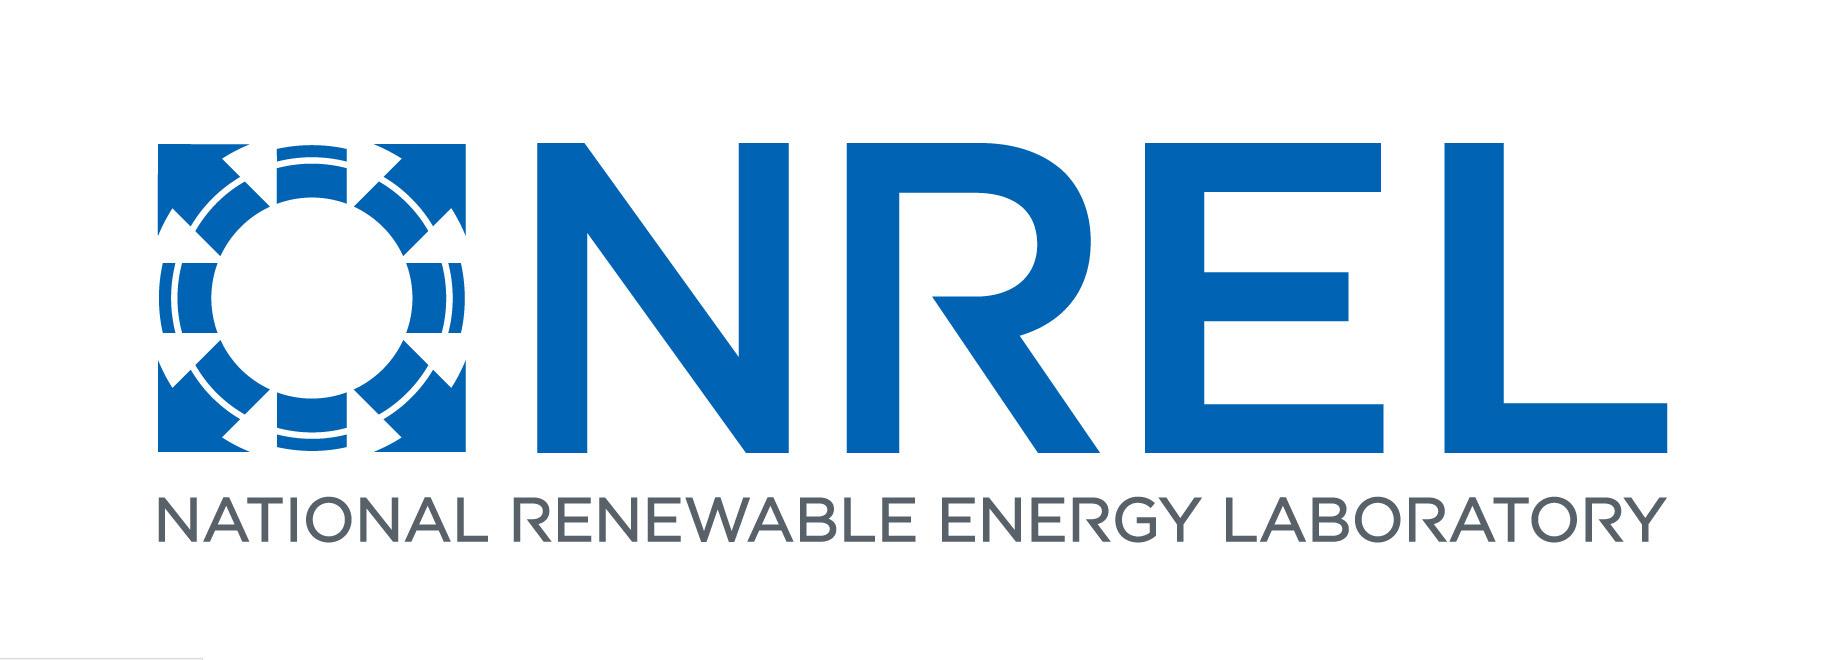 nationalrenewableenergylaboratory(nrel)